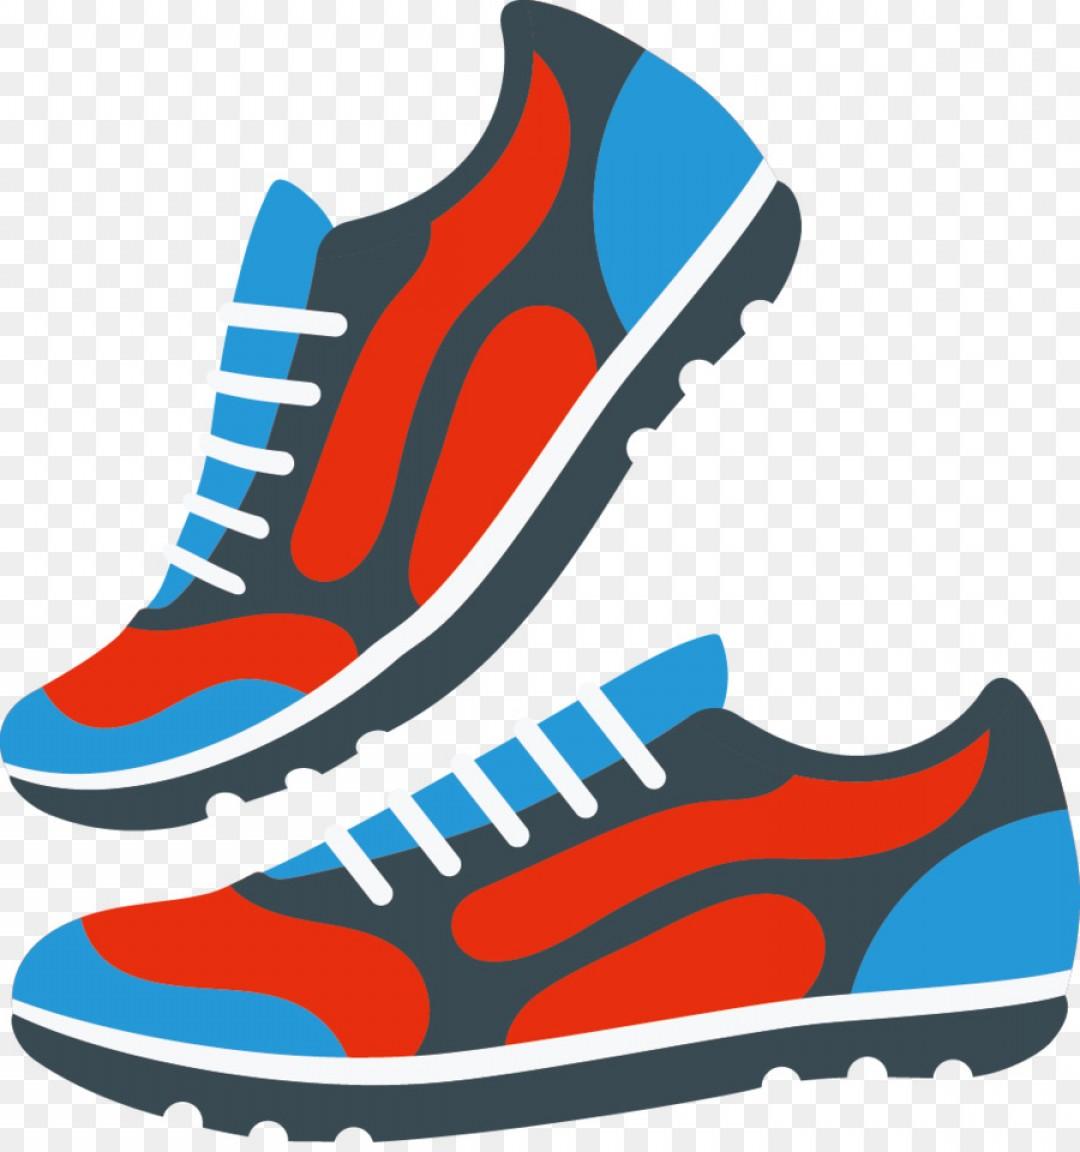 Sneaker Shoe Silhouette Vector.